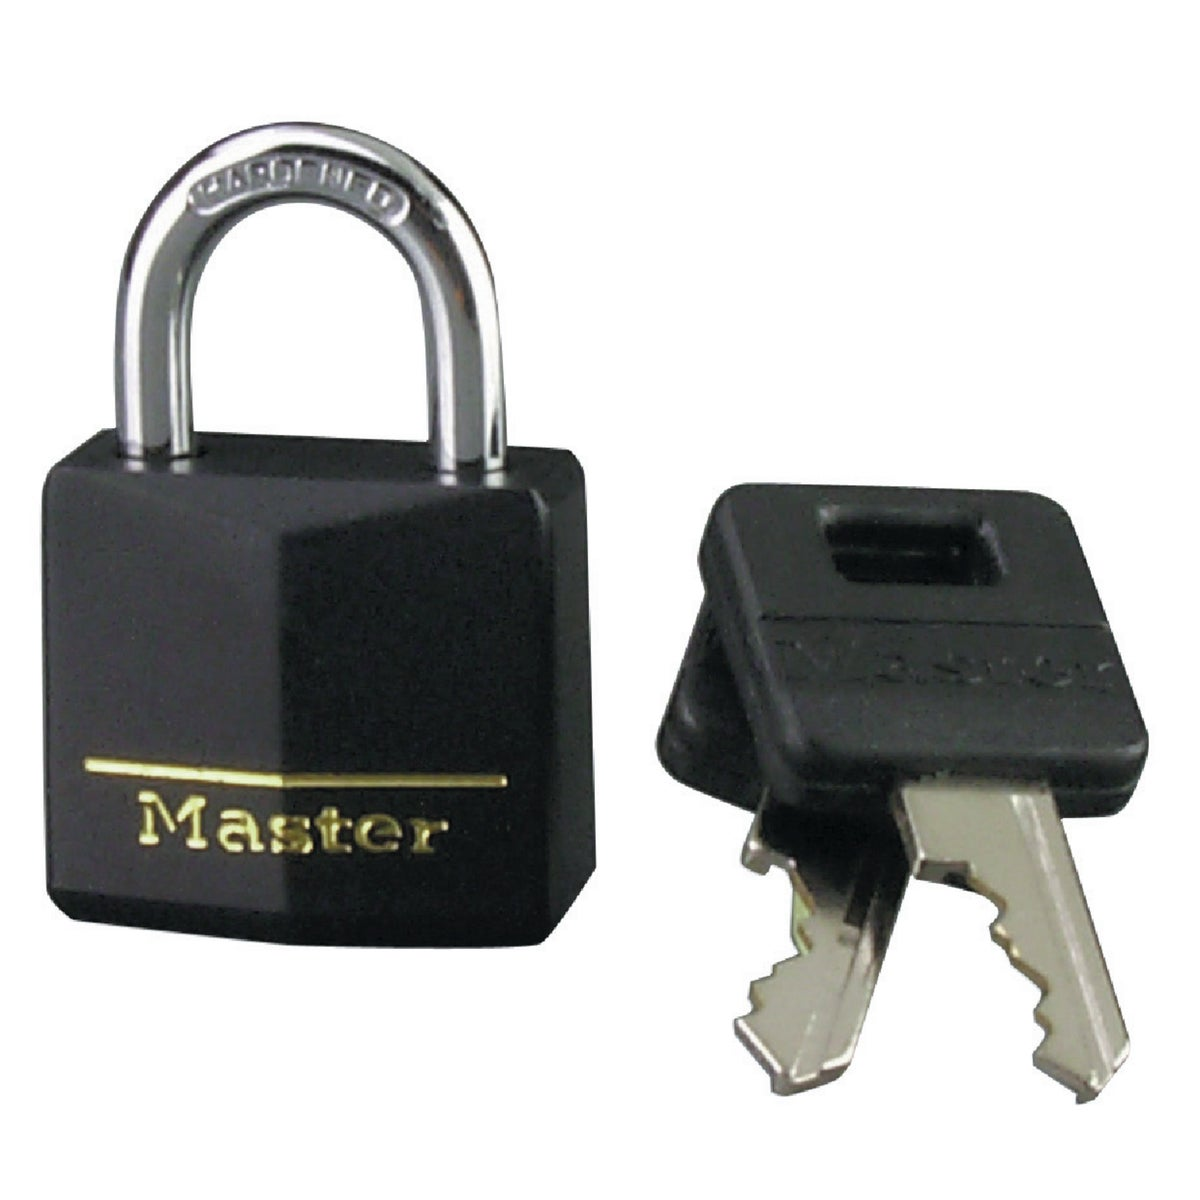 "1-3/16"" CVR ALUM PADLOCK - 131D by Master Lock Company"